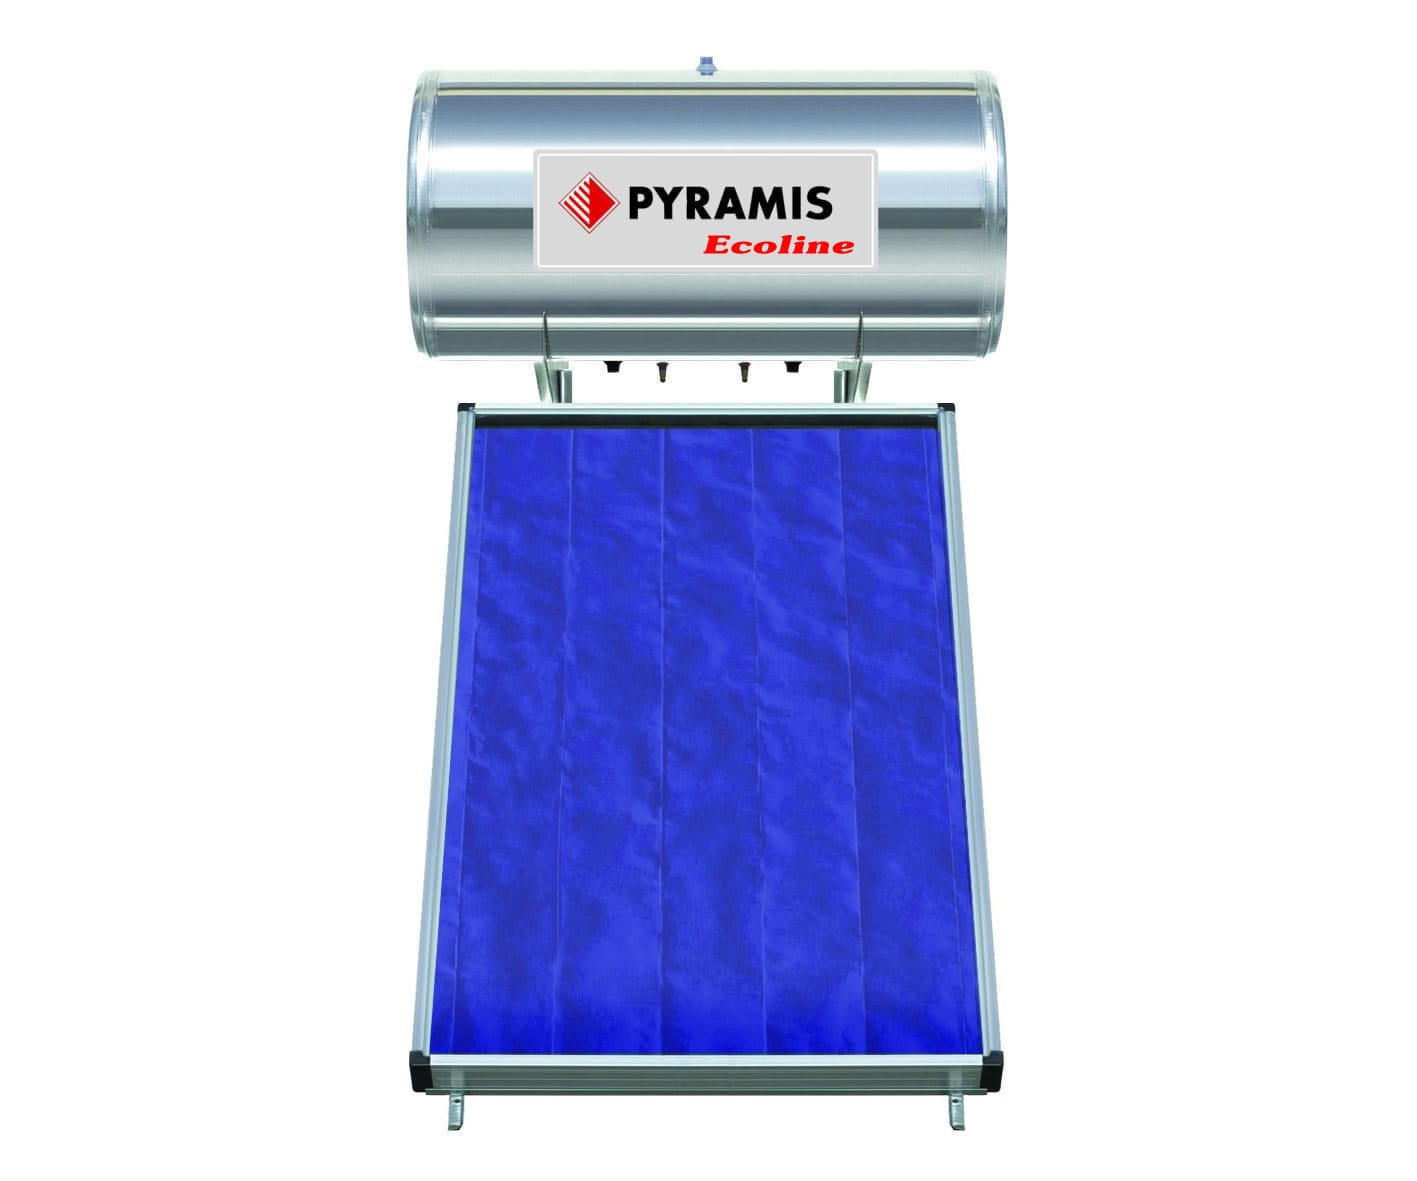 Pyramis Ηλιακός Θερμοσίφωνας 160lt Διπλής Ενεργείας 026000307 ECOLINE